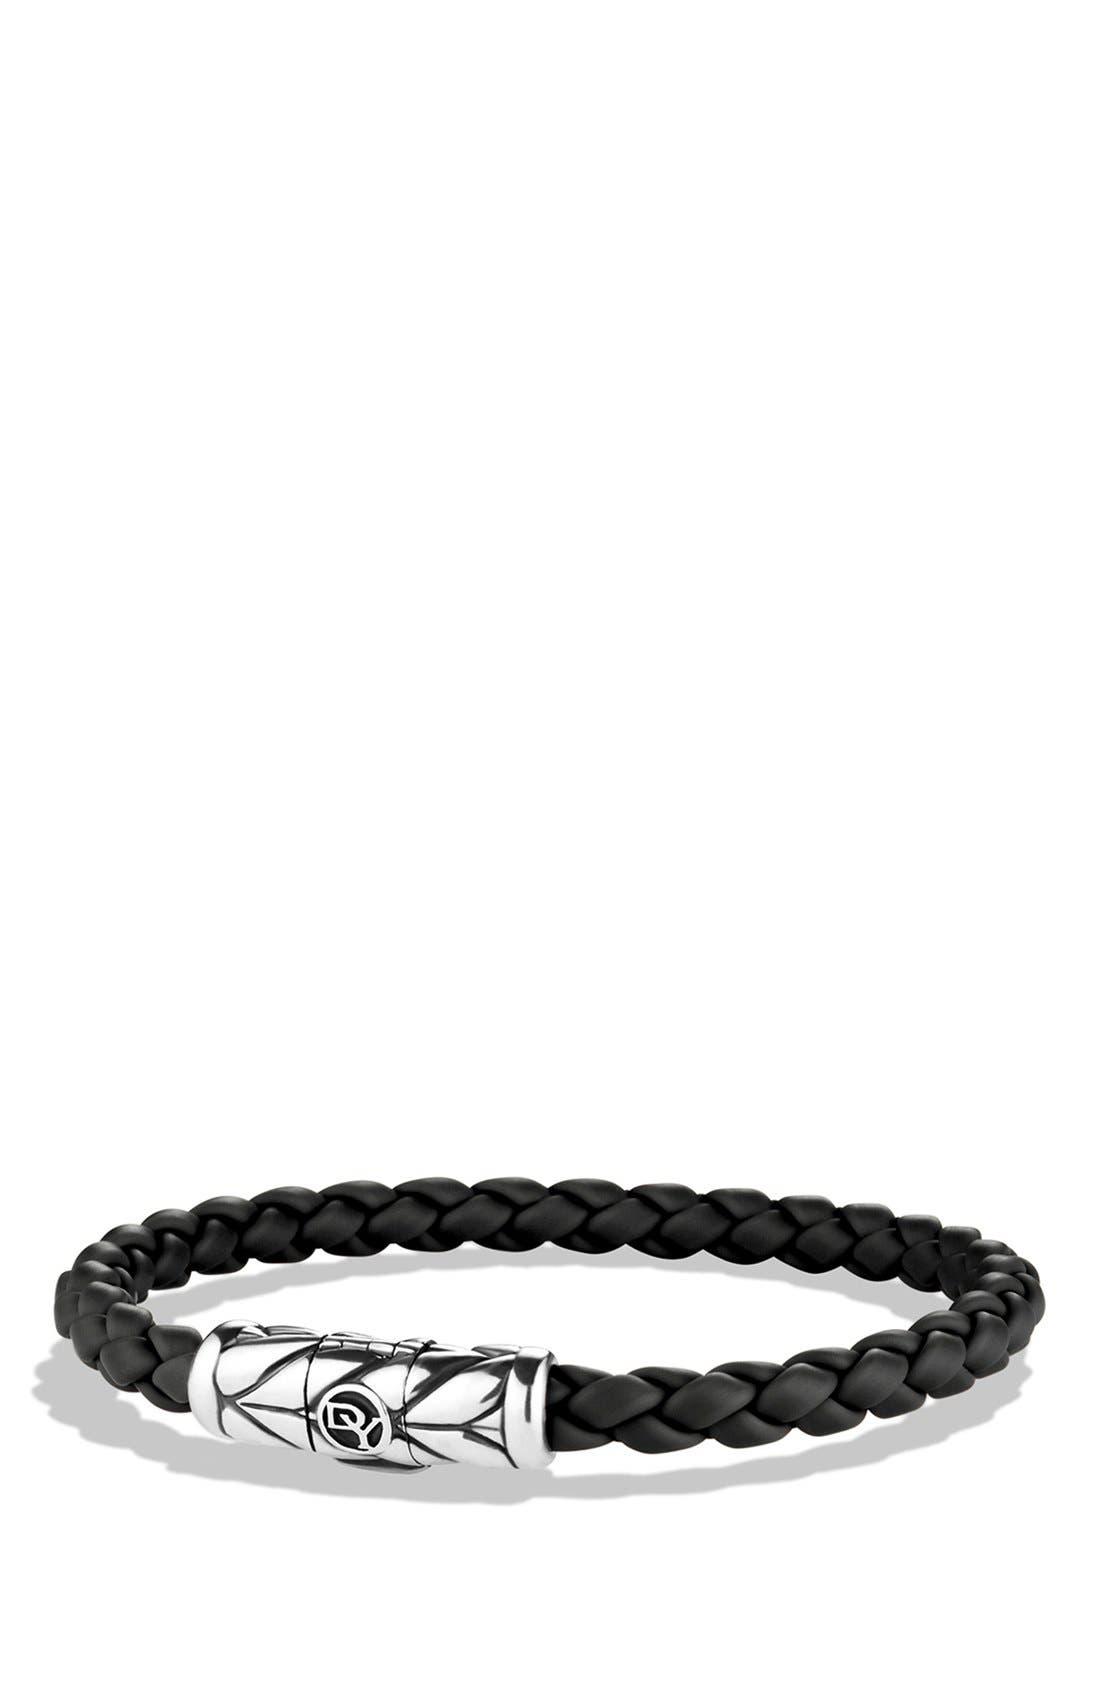 DAVID YURMAN, 'Chevron' Woven Rubber Bracelet, Main thumbnail 1, color, BLACK